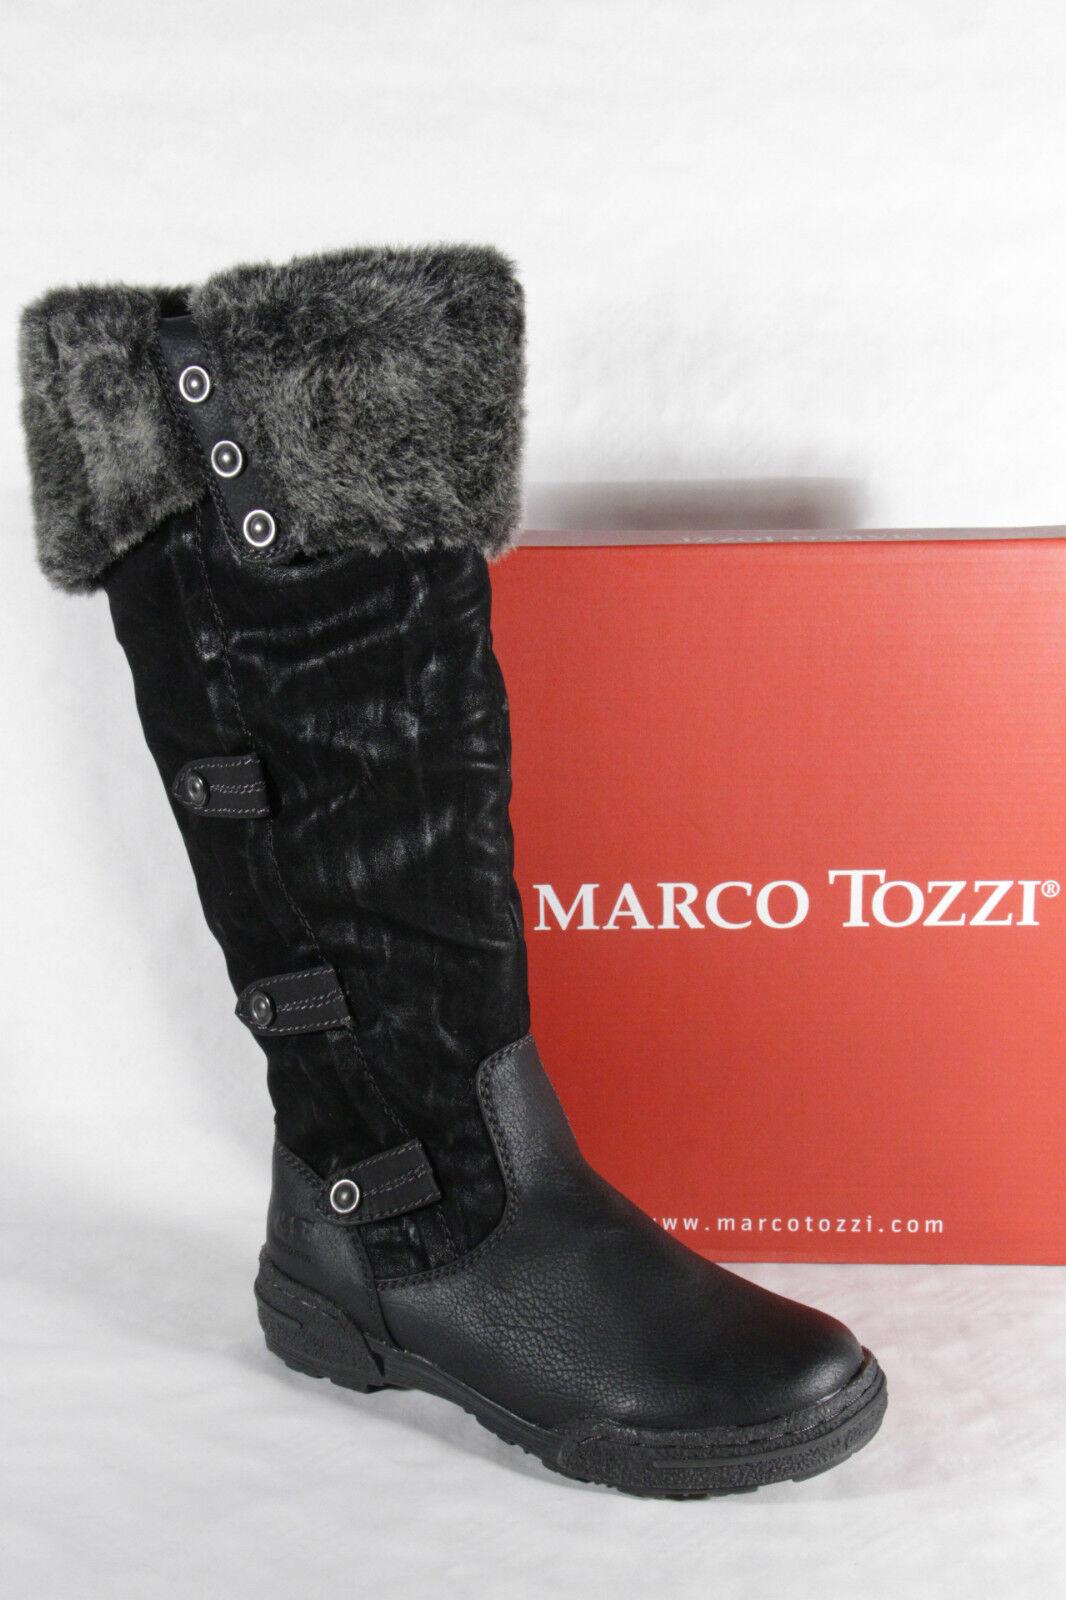 Marco Tozzi Damen Stiefel schwarz Neu